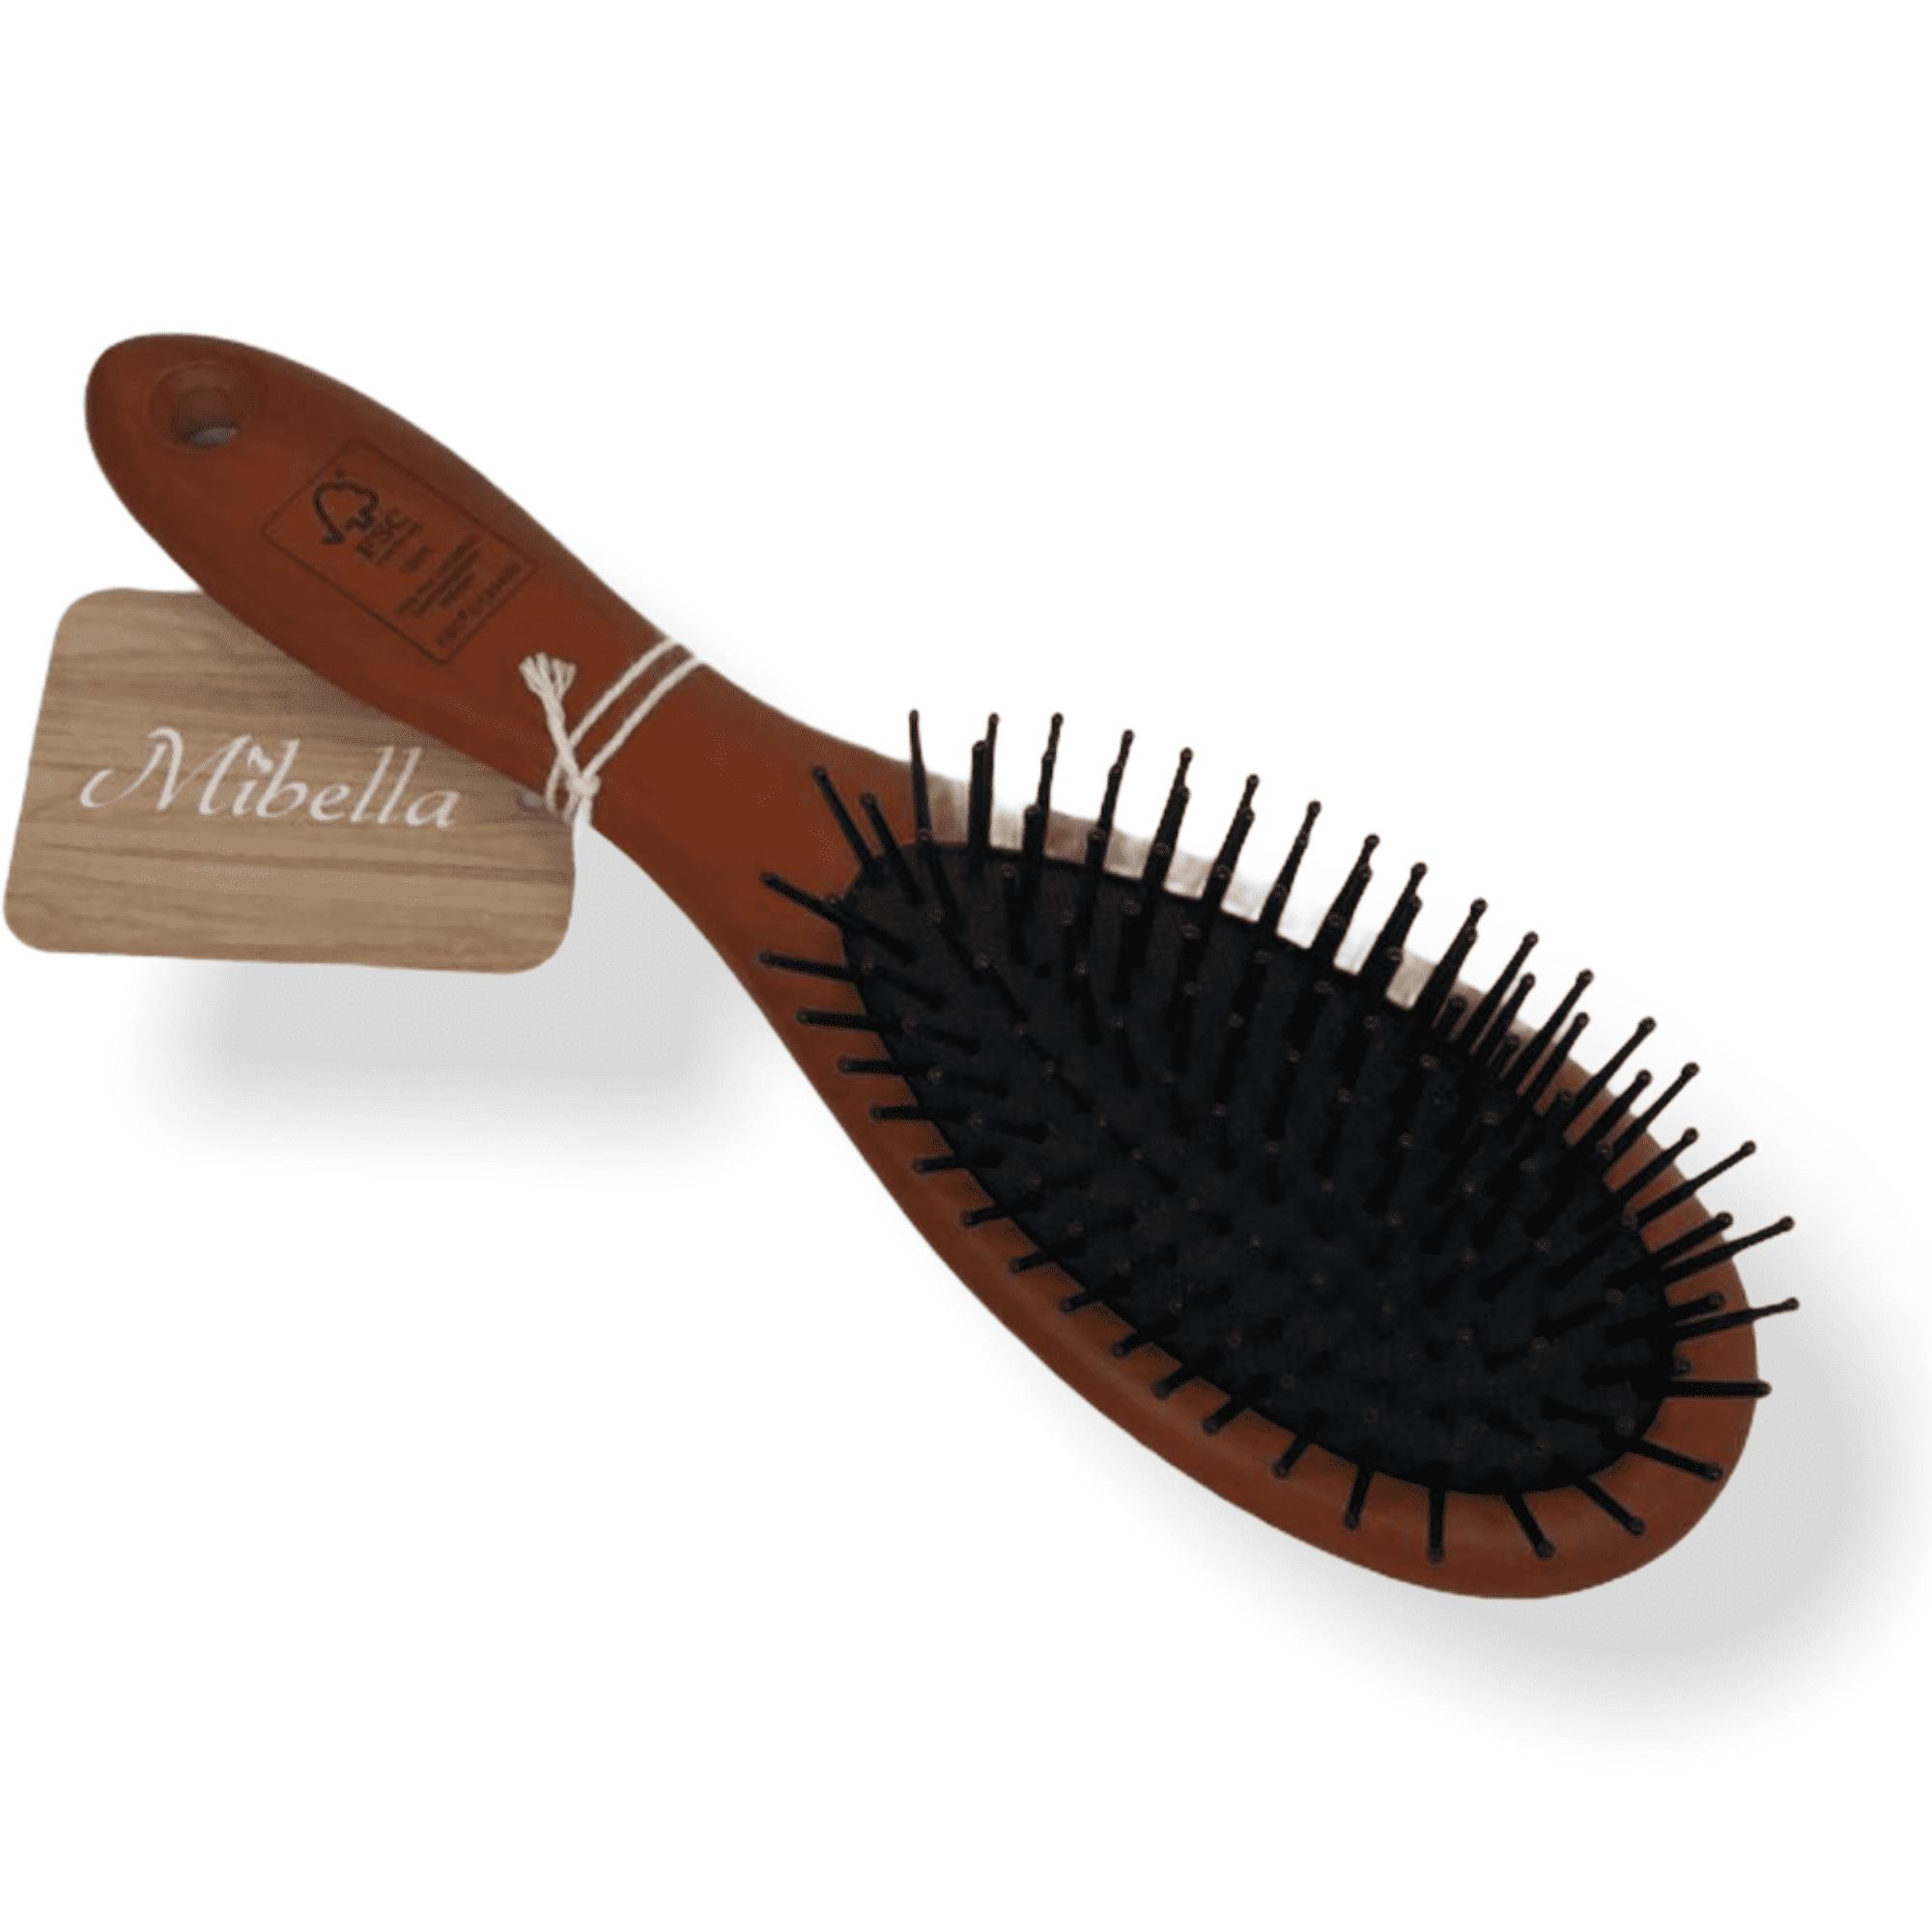 Haarbürste mit Holzgriff